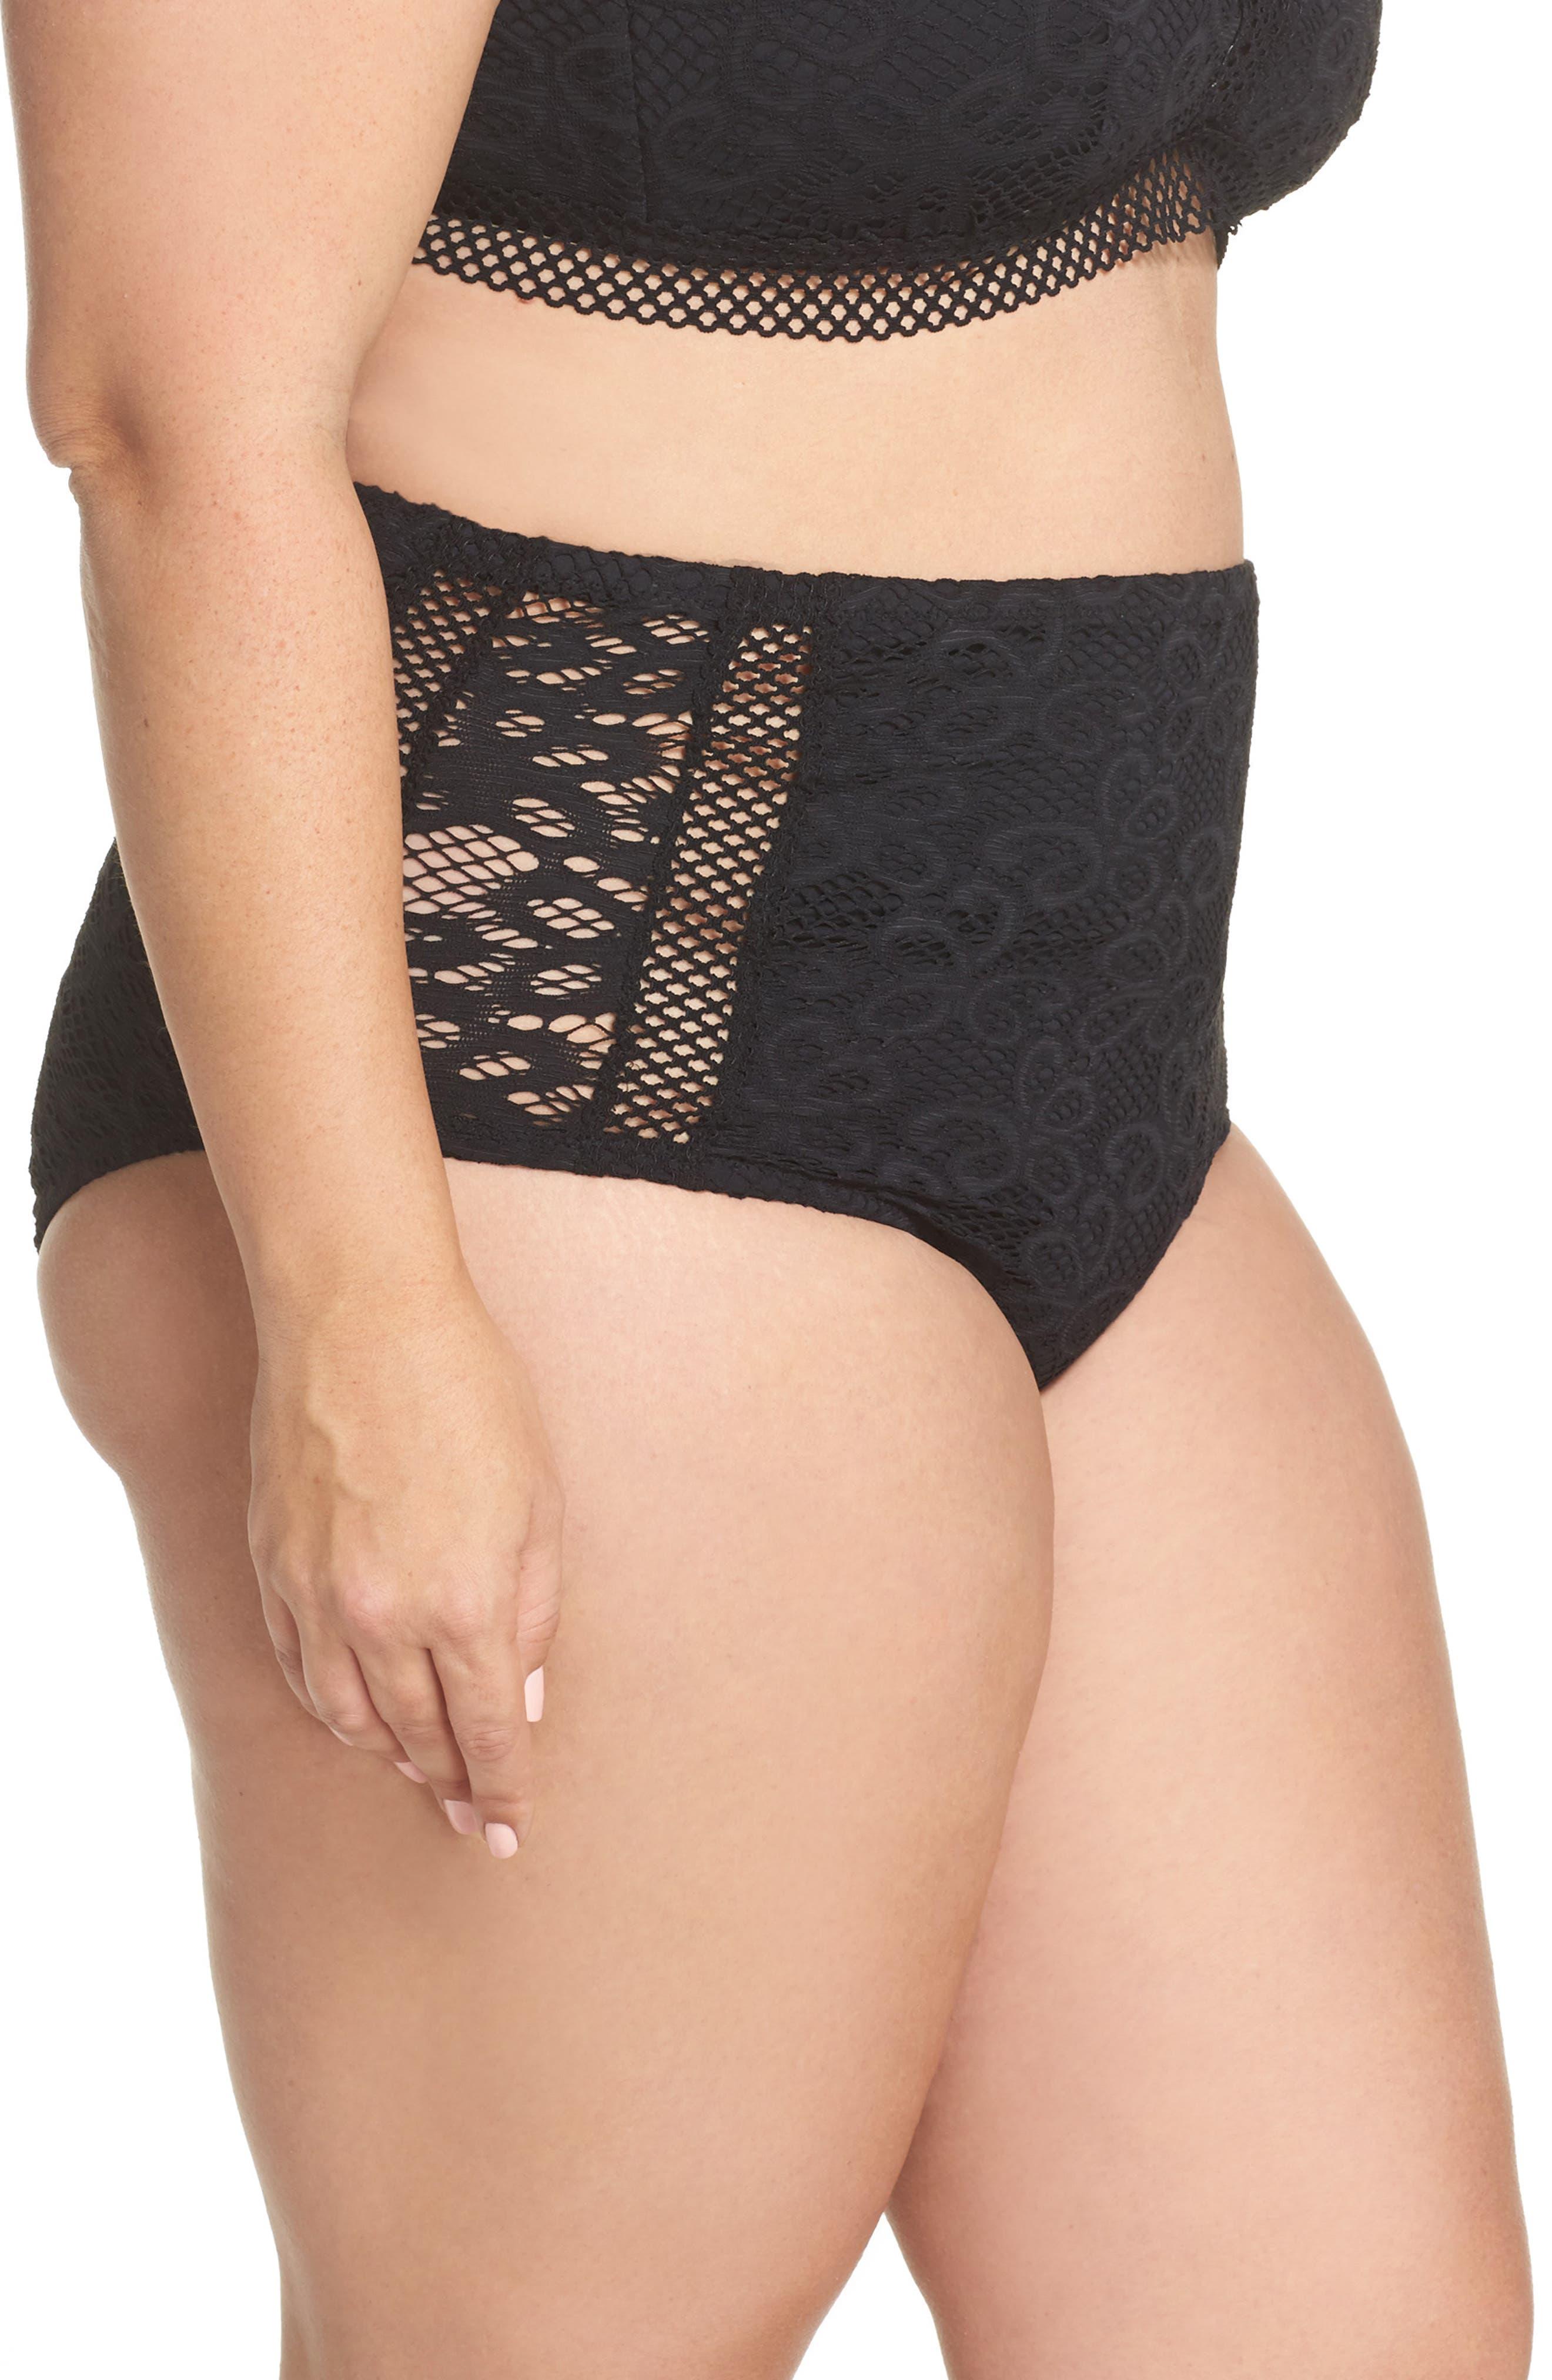 Becca Captured High Waist Bikini Bottoms,                             Alternate thumbnail 3, color,                             Black